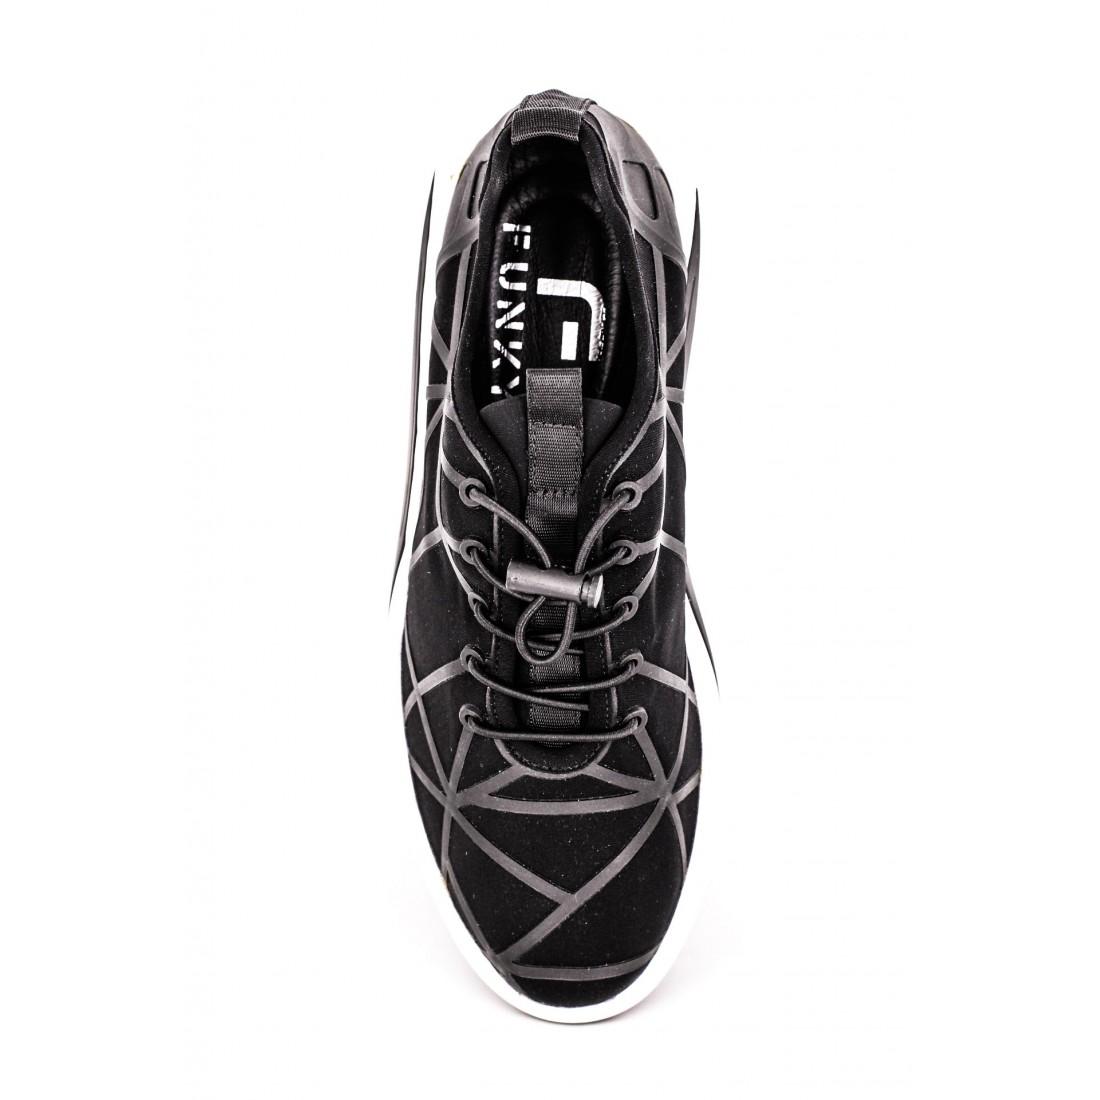 Sneakers Barbati Navy Black